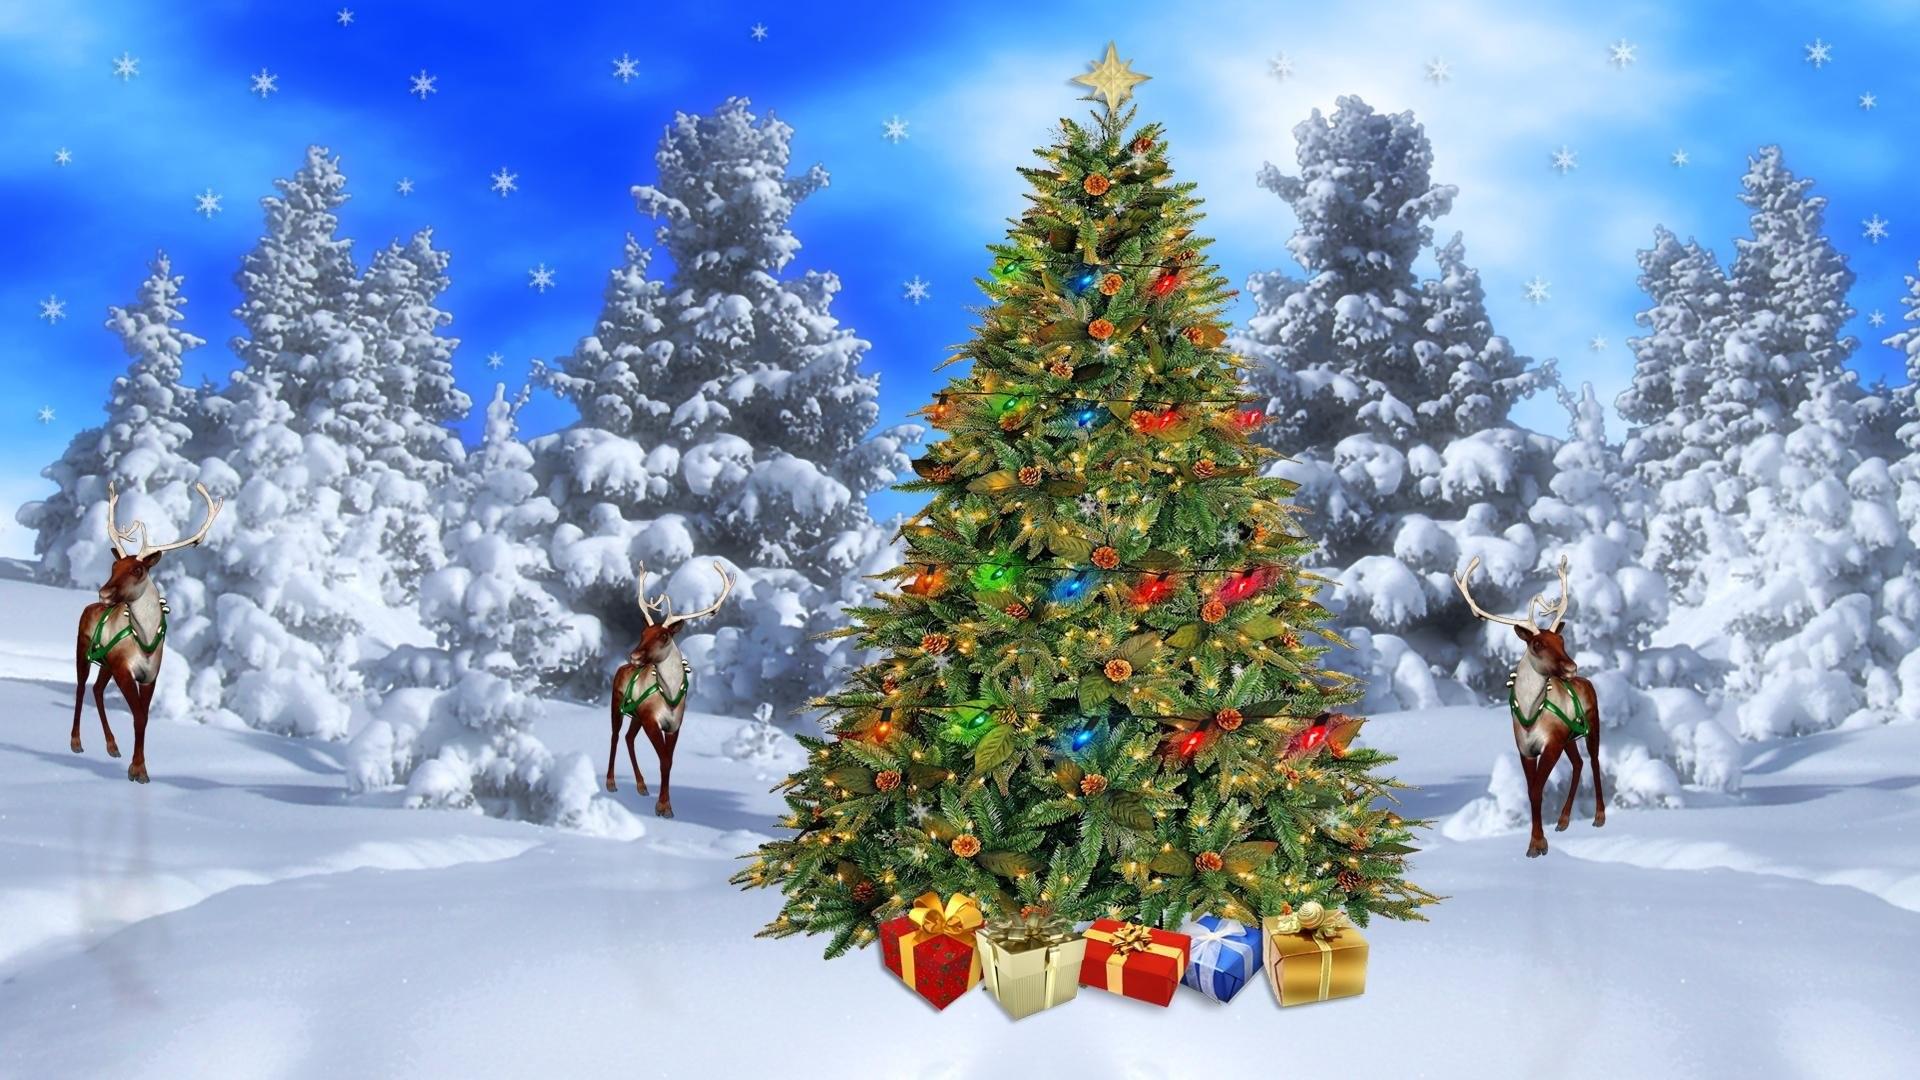 1920x1080 christmas scene download standard